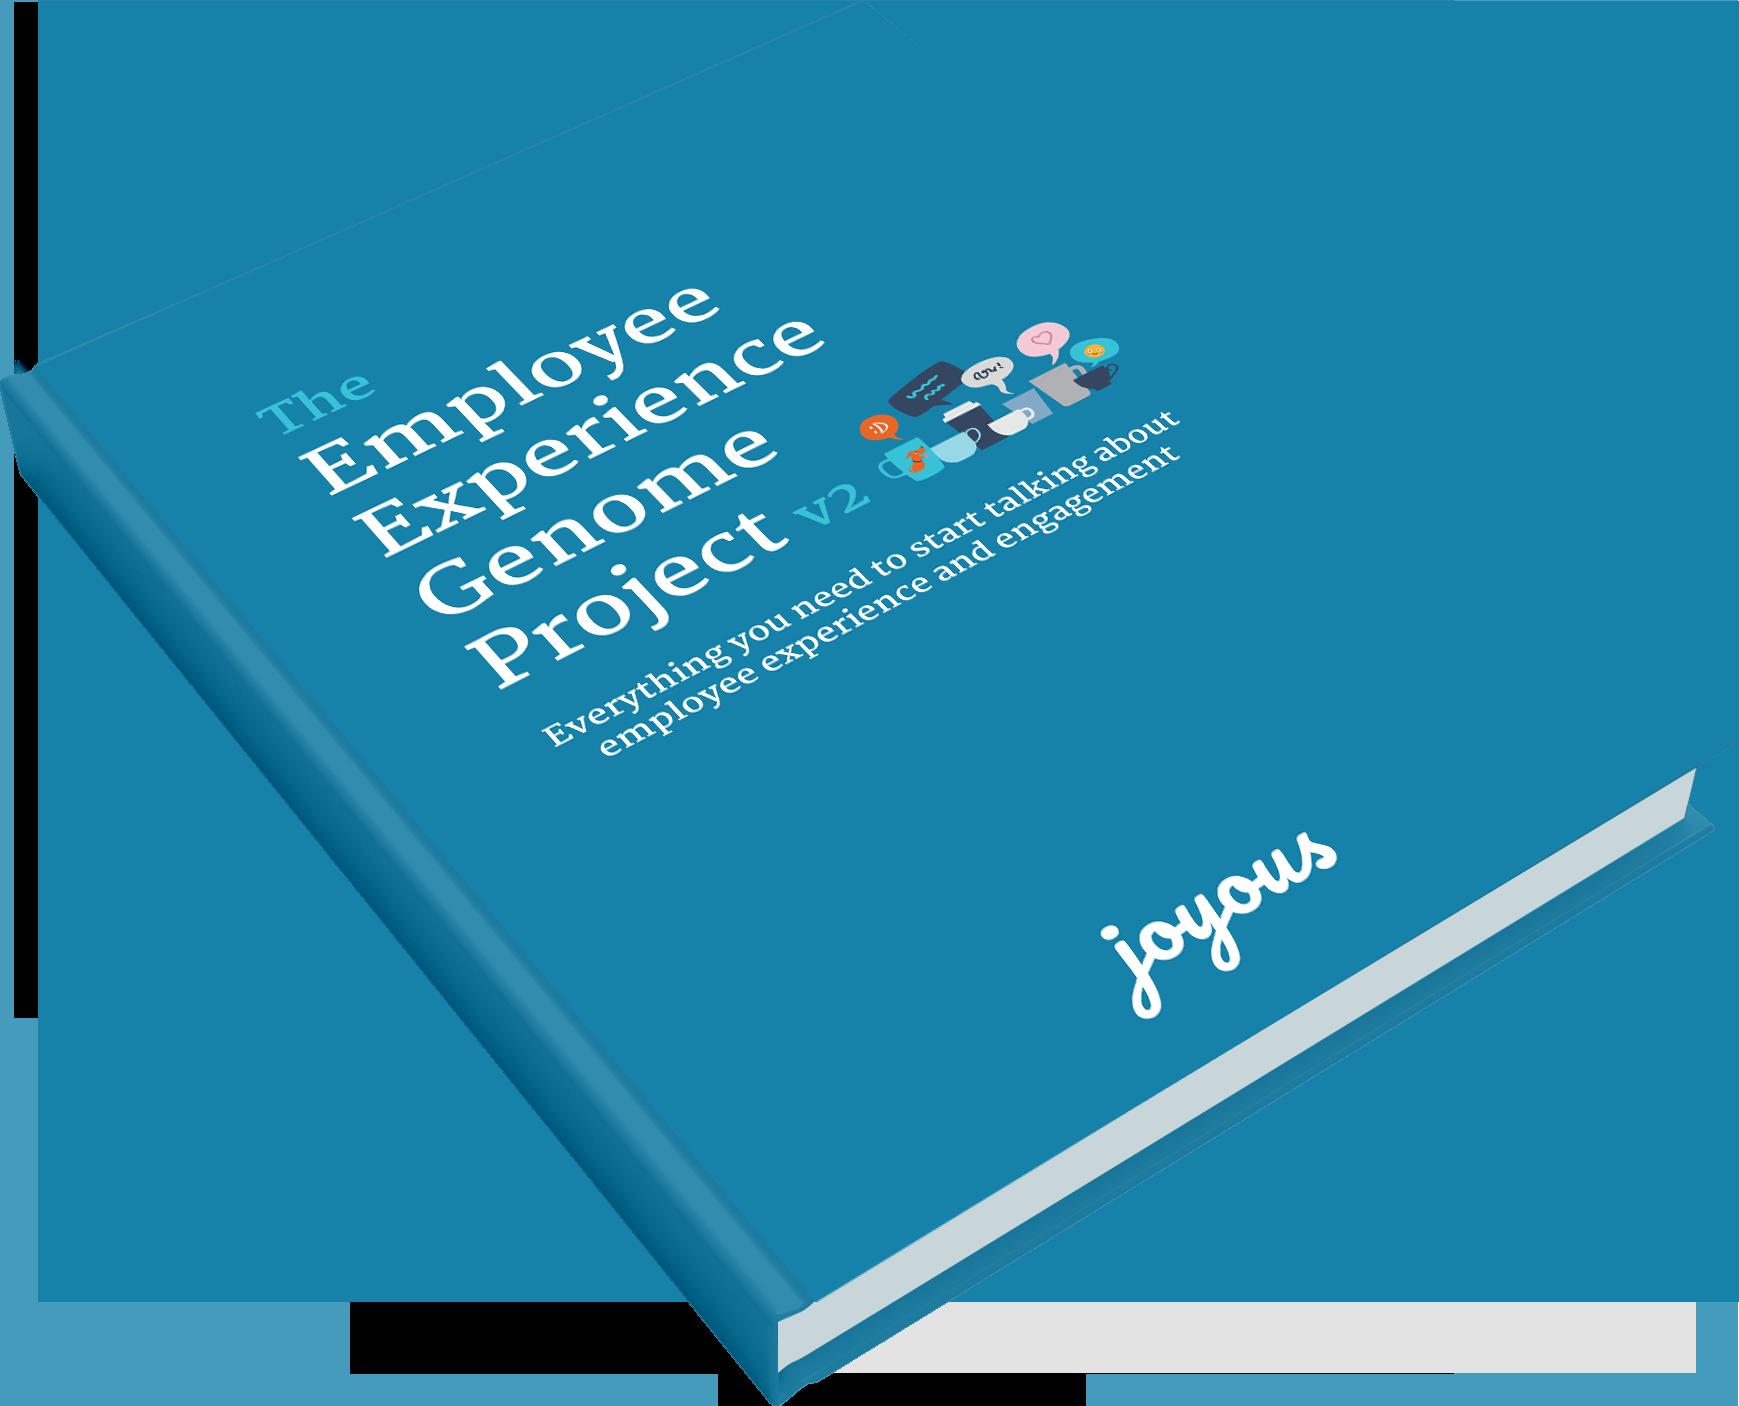 download-exgenome-book-v2